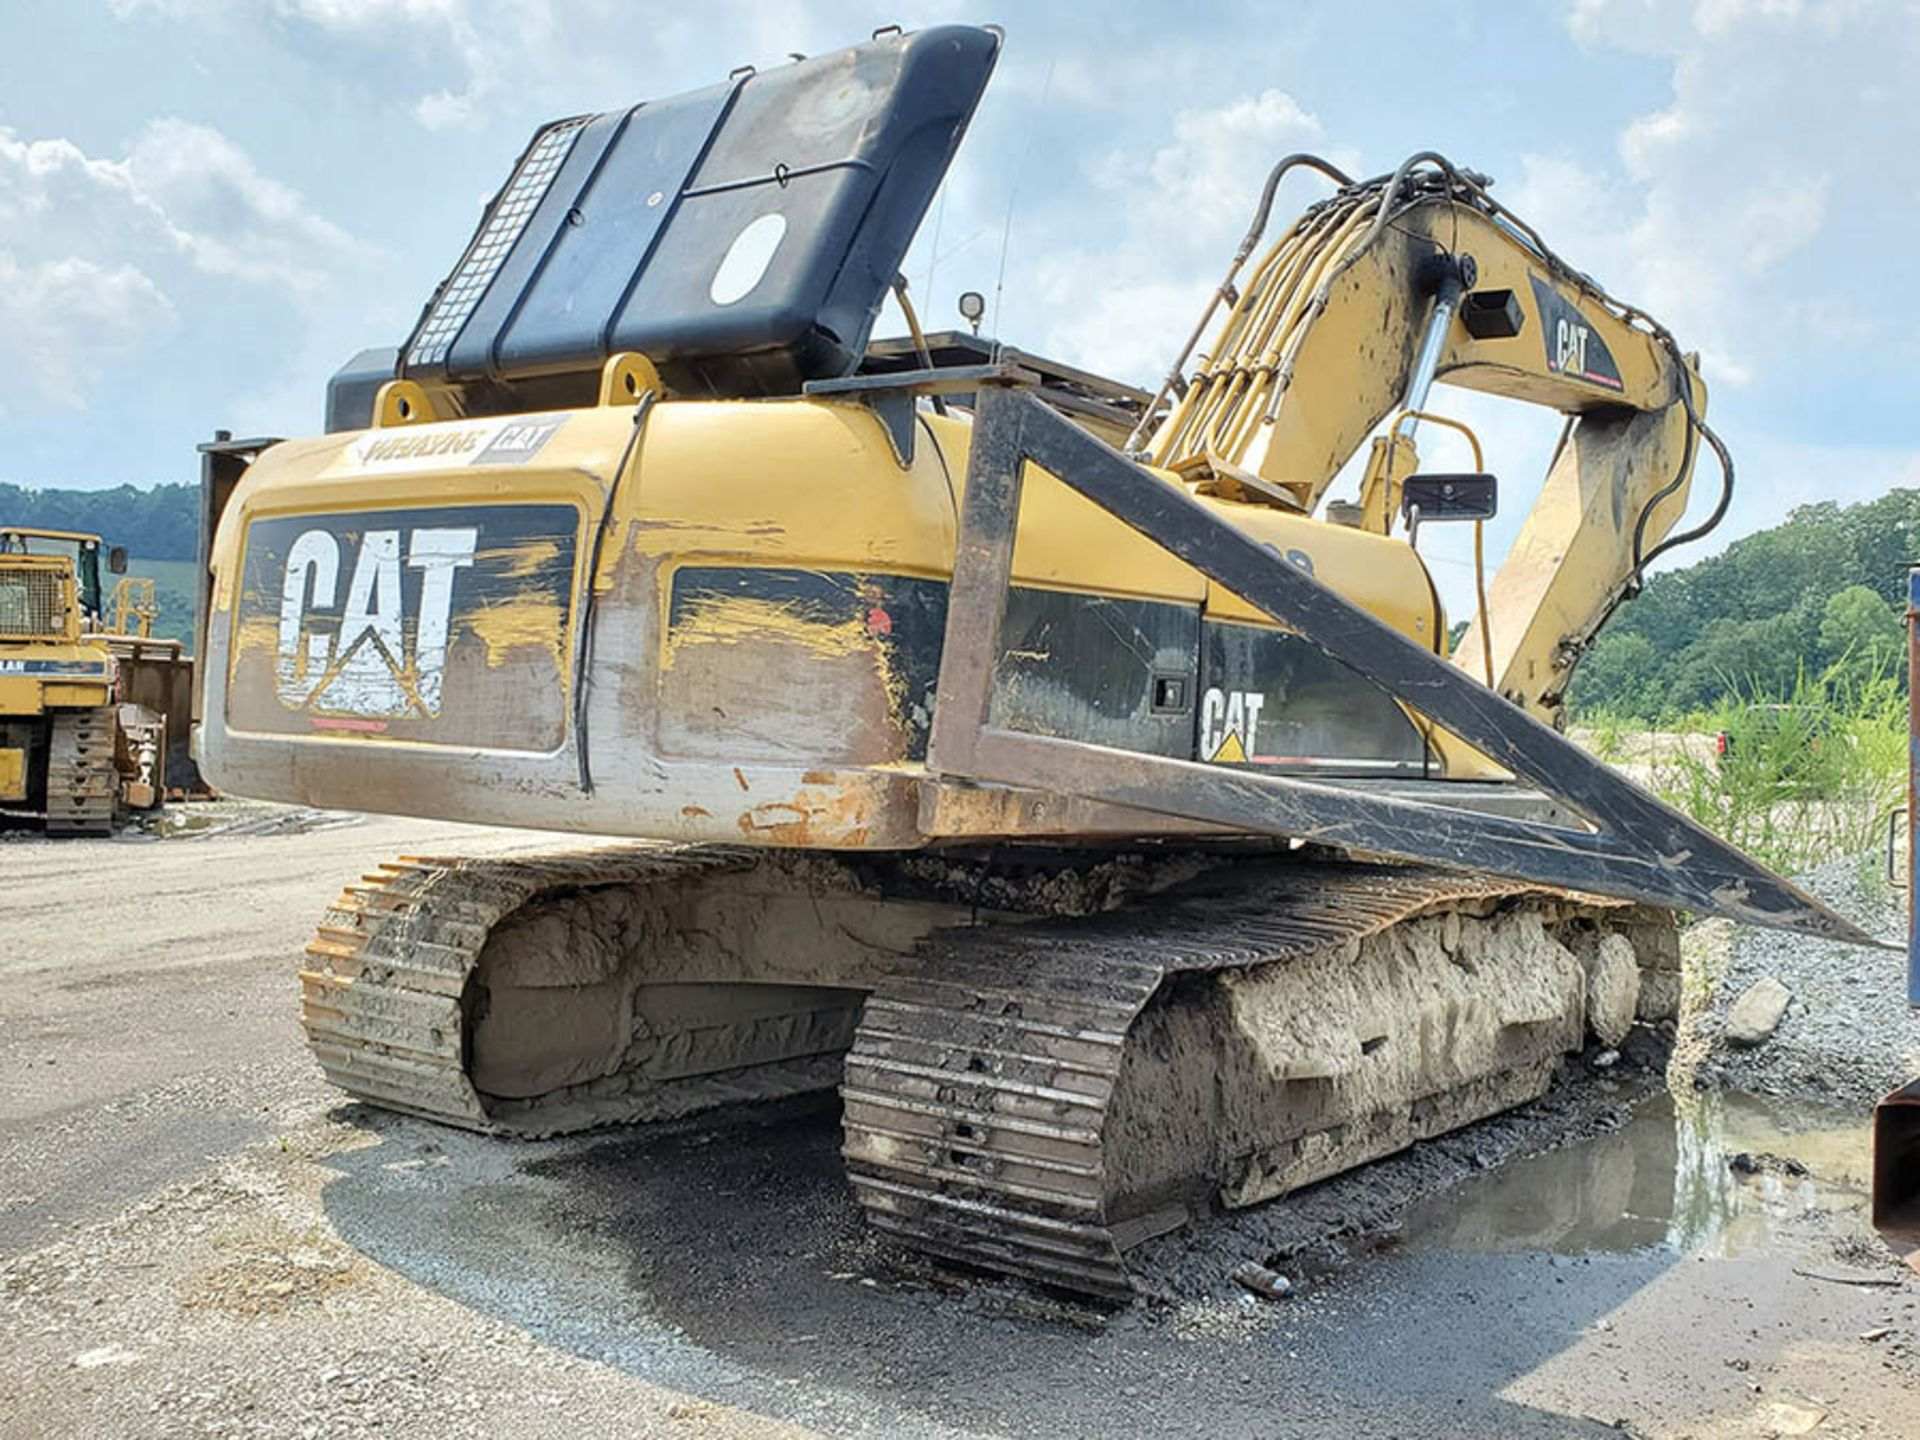 Lot 116 - CATERPILLAR 330D EXCAVATOR, S/N: CAT0330DLB6H00526, 20,294 HOURS SHOWING, CAT 6-CYLINDER DIESEL